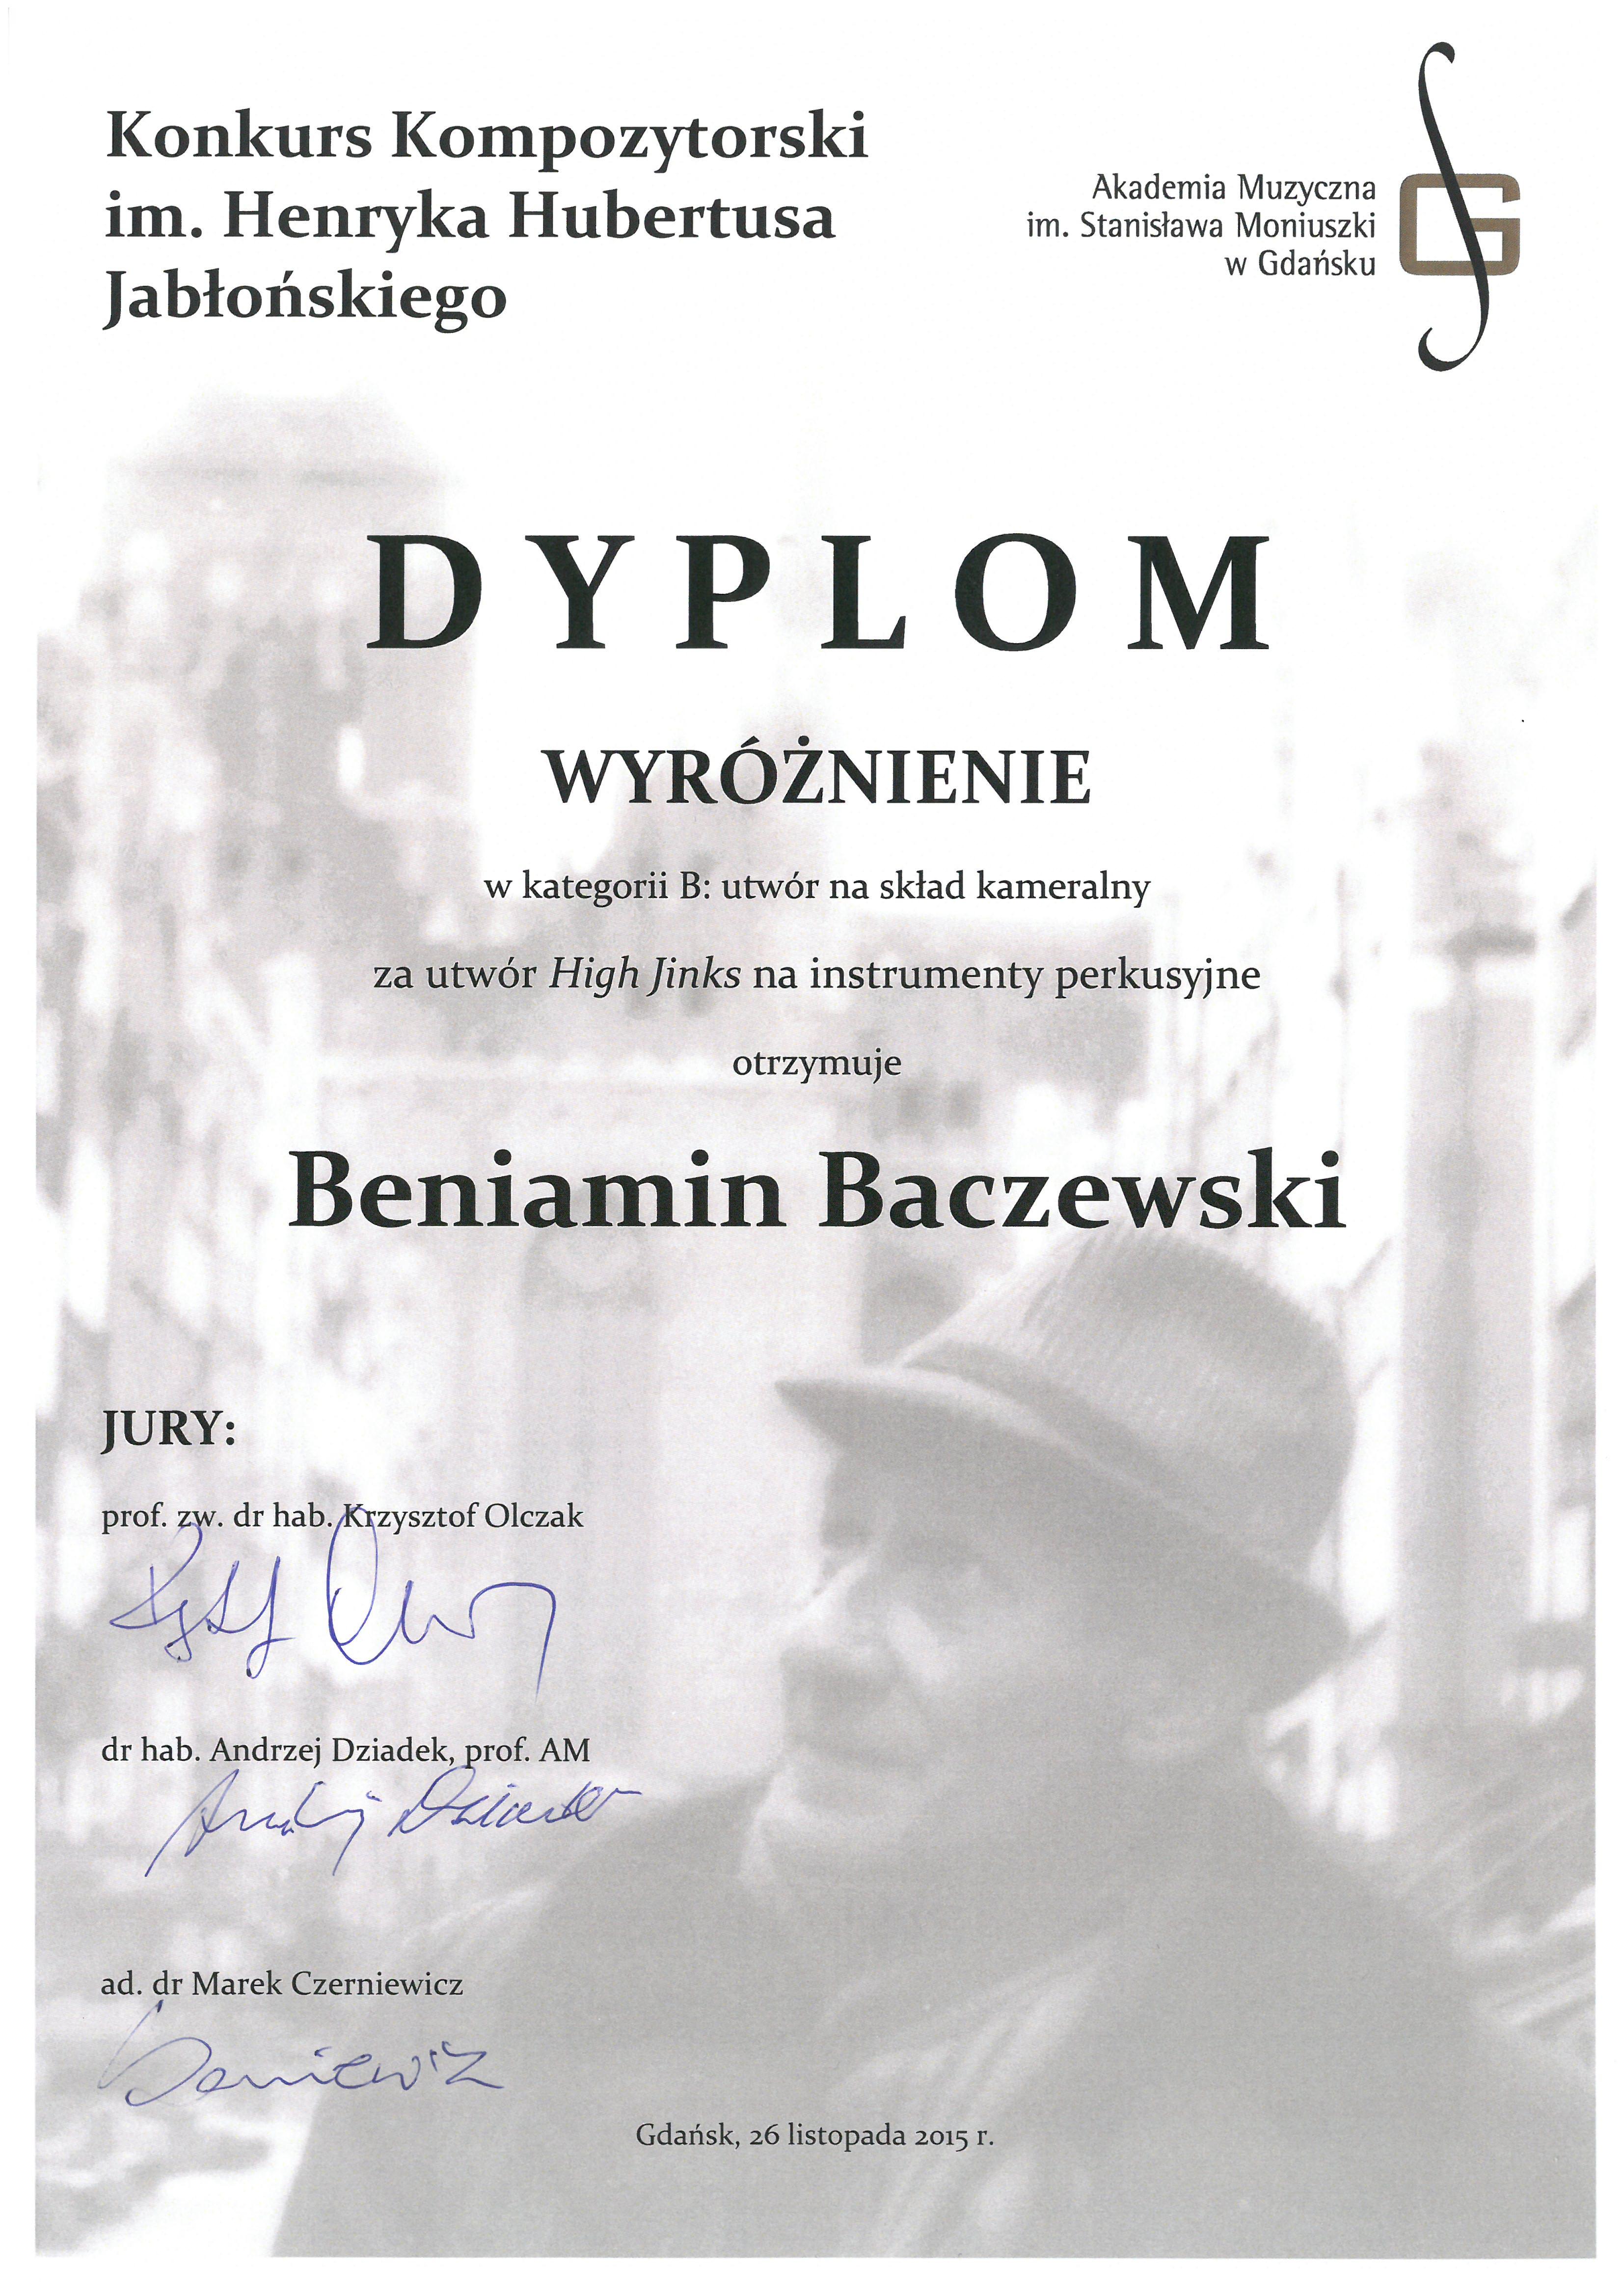 Baczewski_Beniamin_dyplom_wyr_KK_HHJ